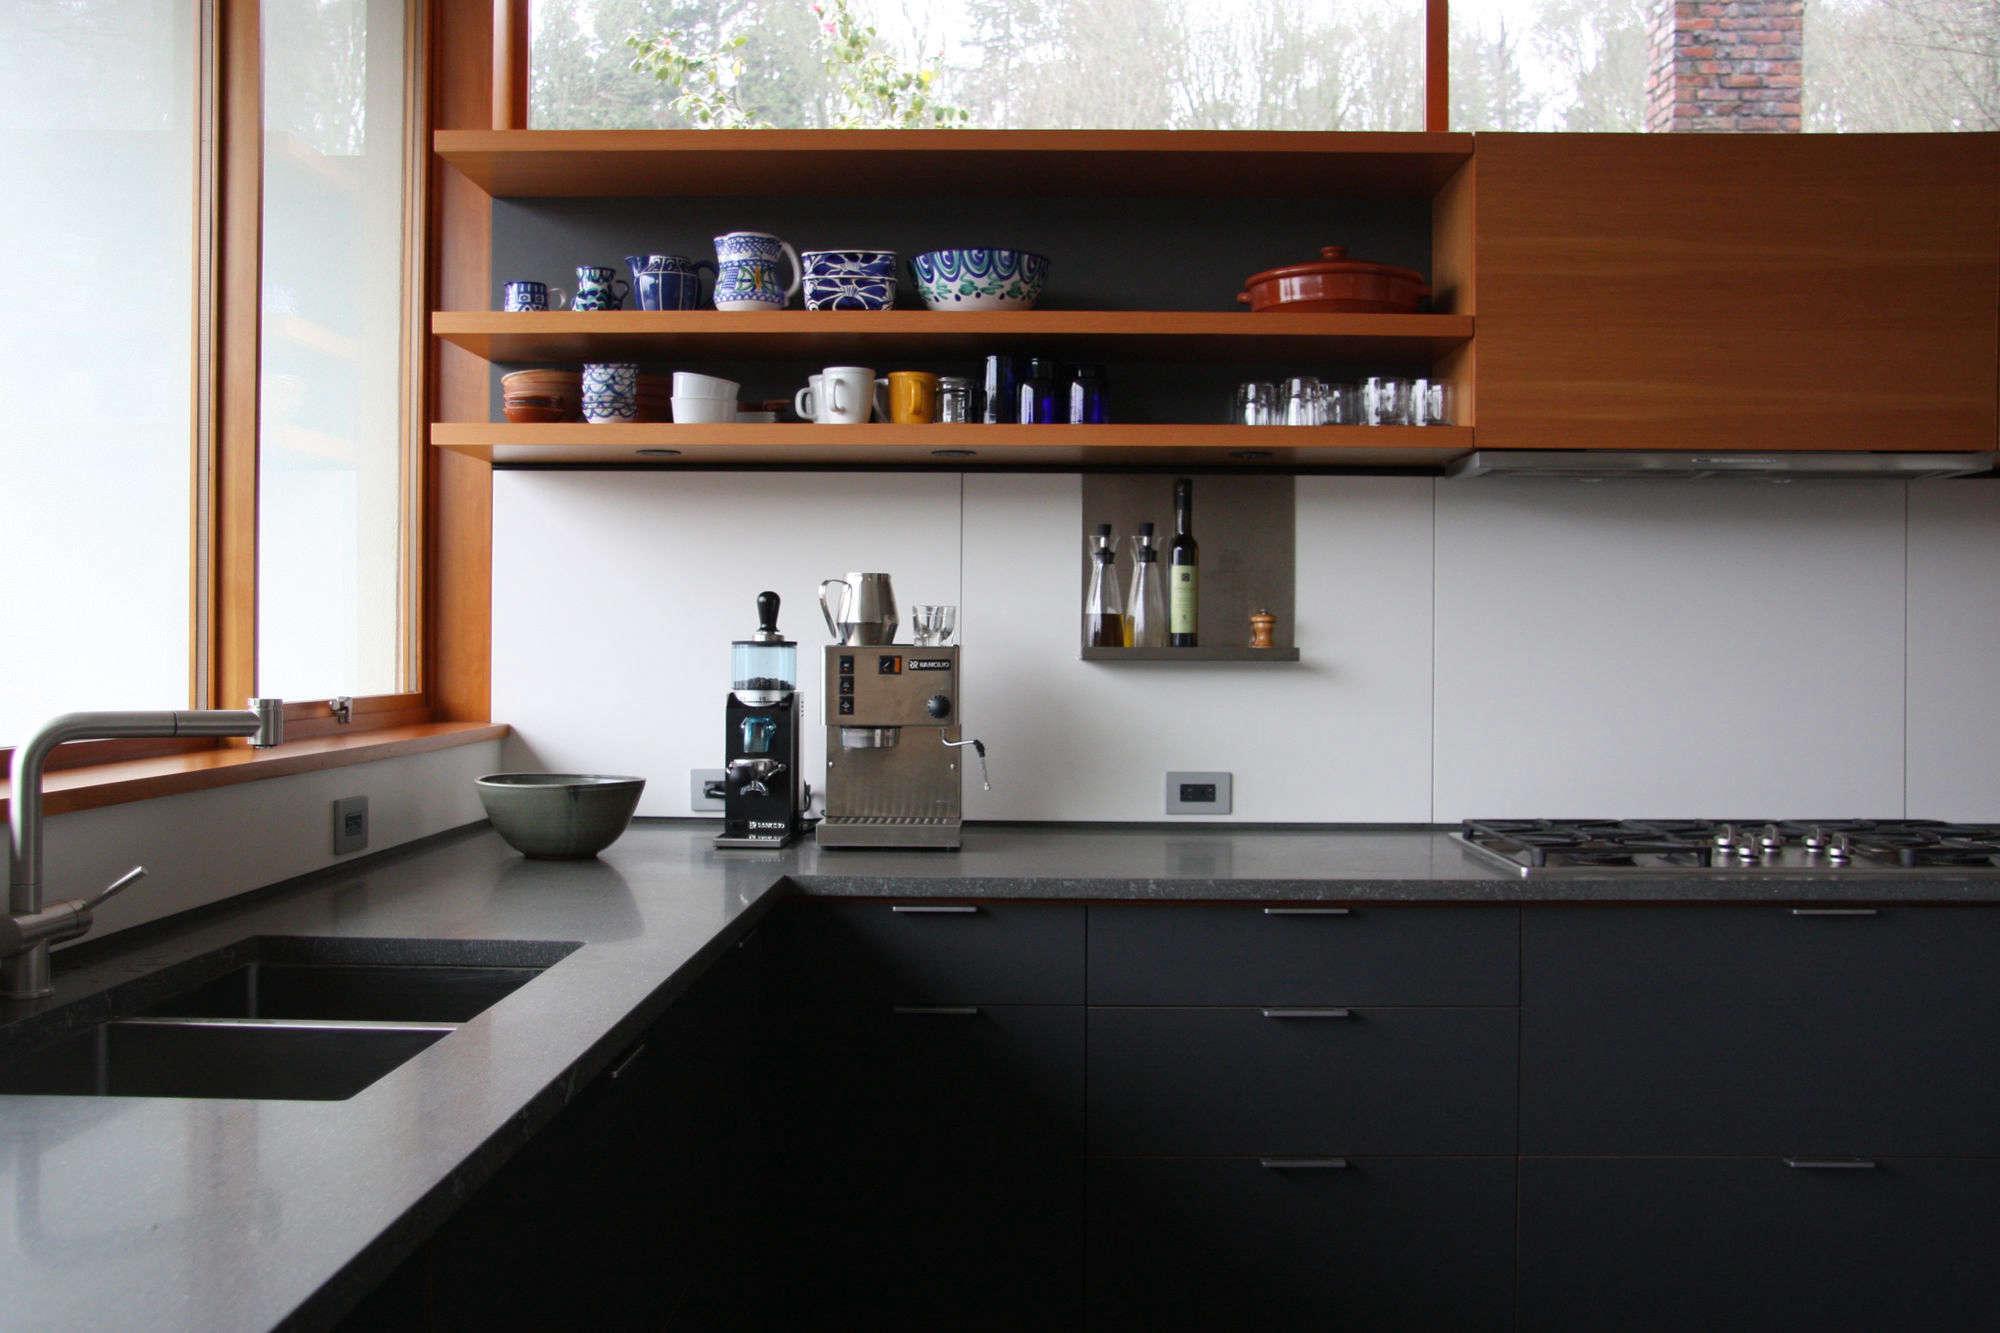 remodeling soapstone kitchen countertop pros and cons soapstone kitchen countertops